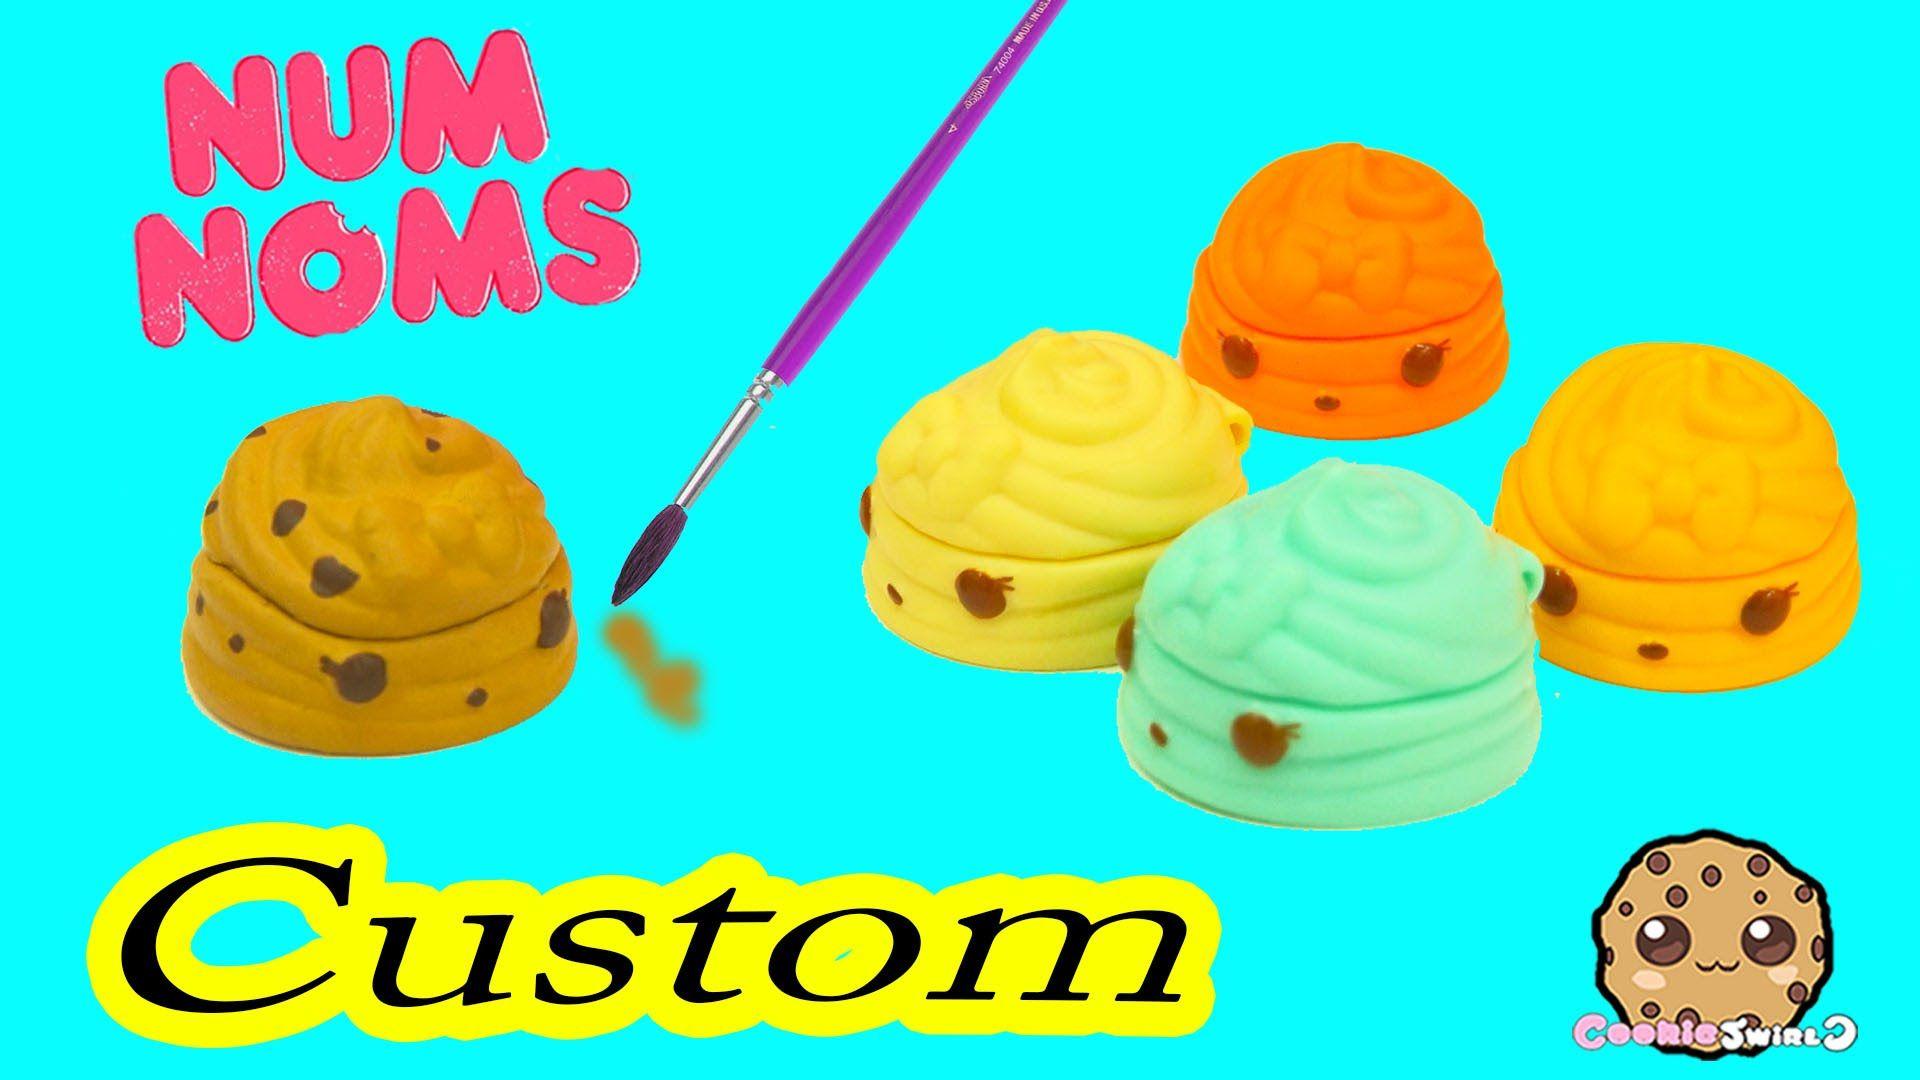 Diy custom painting num noms lip gloss toy do it yourself craft diy custom painting num noms lip gloss toy do it yourself craft cookie solutioingenieria Gallery